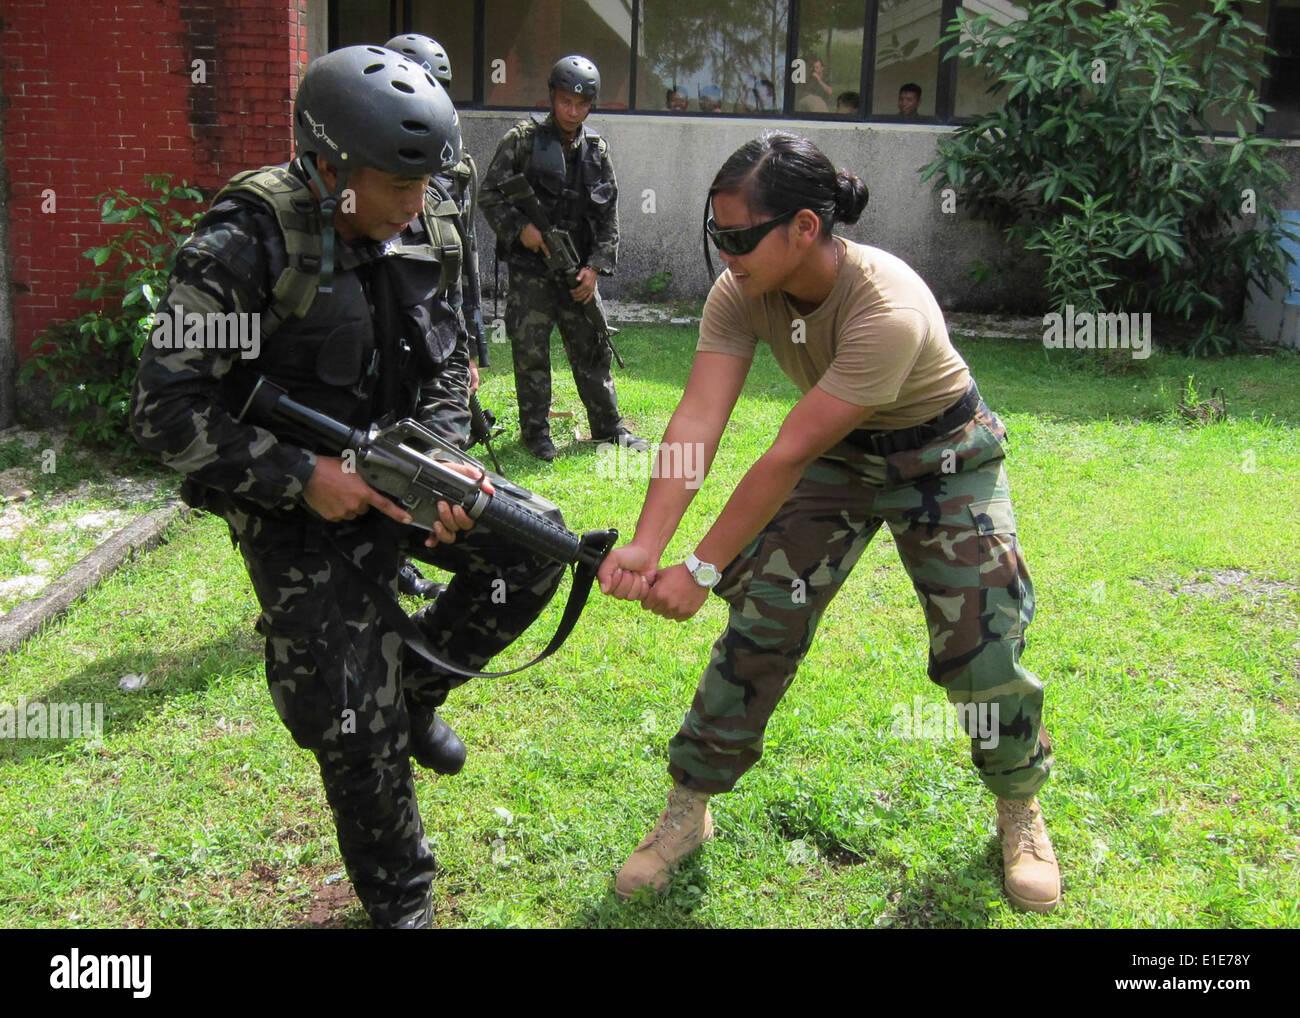 U.S. Navy Master-at-Arms 3rd Class Tanya Wedler demonstrates close ...